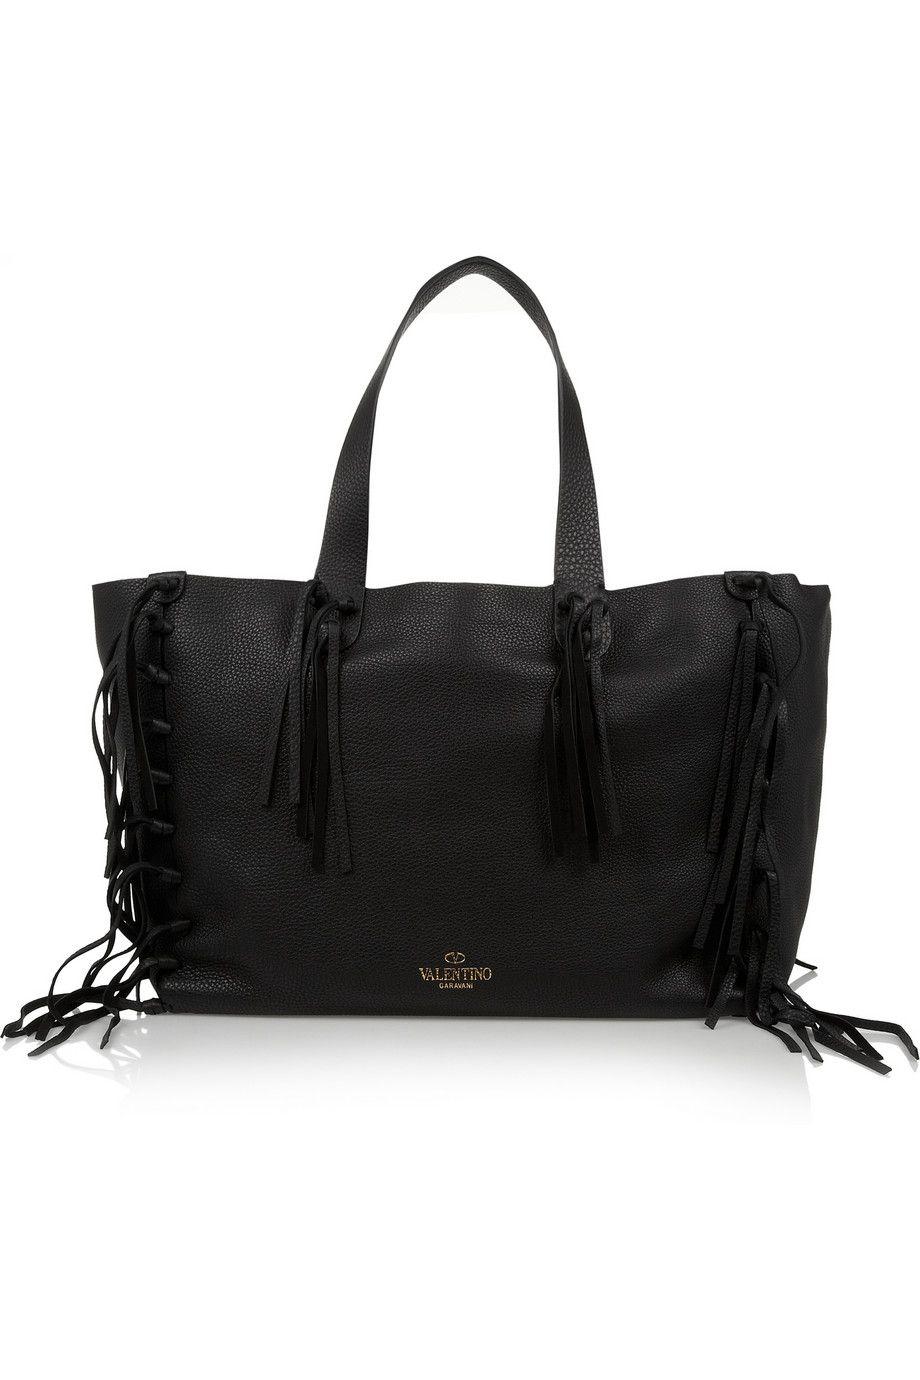 Valentino C-Rockee tasseled leather tote NET-A-PORTER.COM